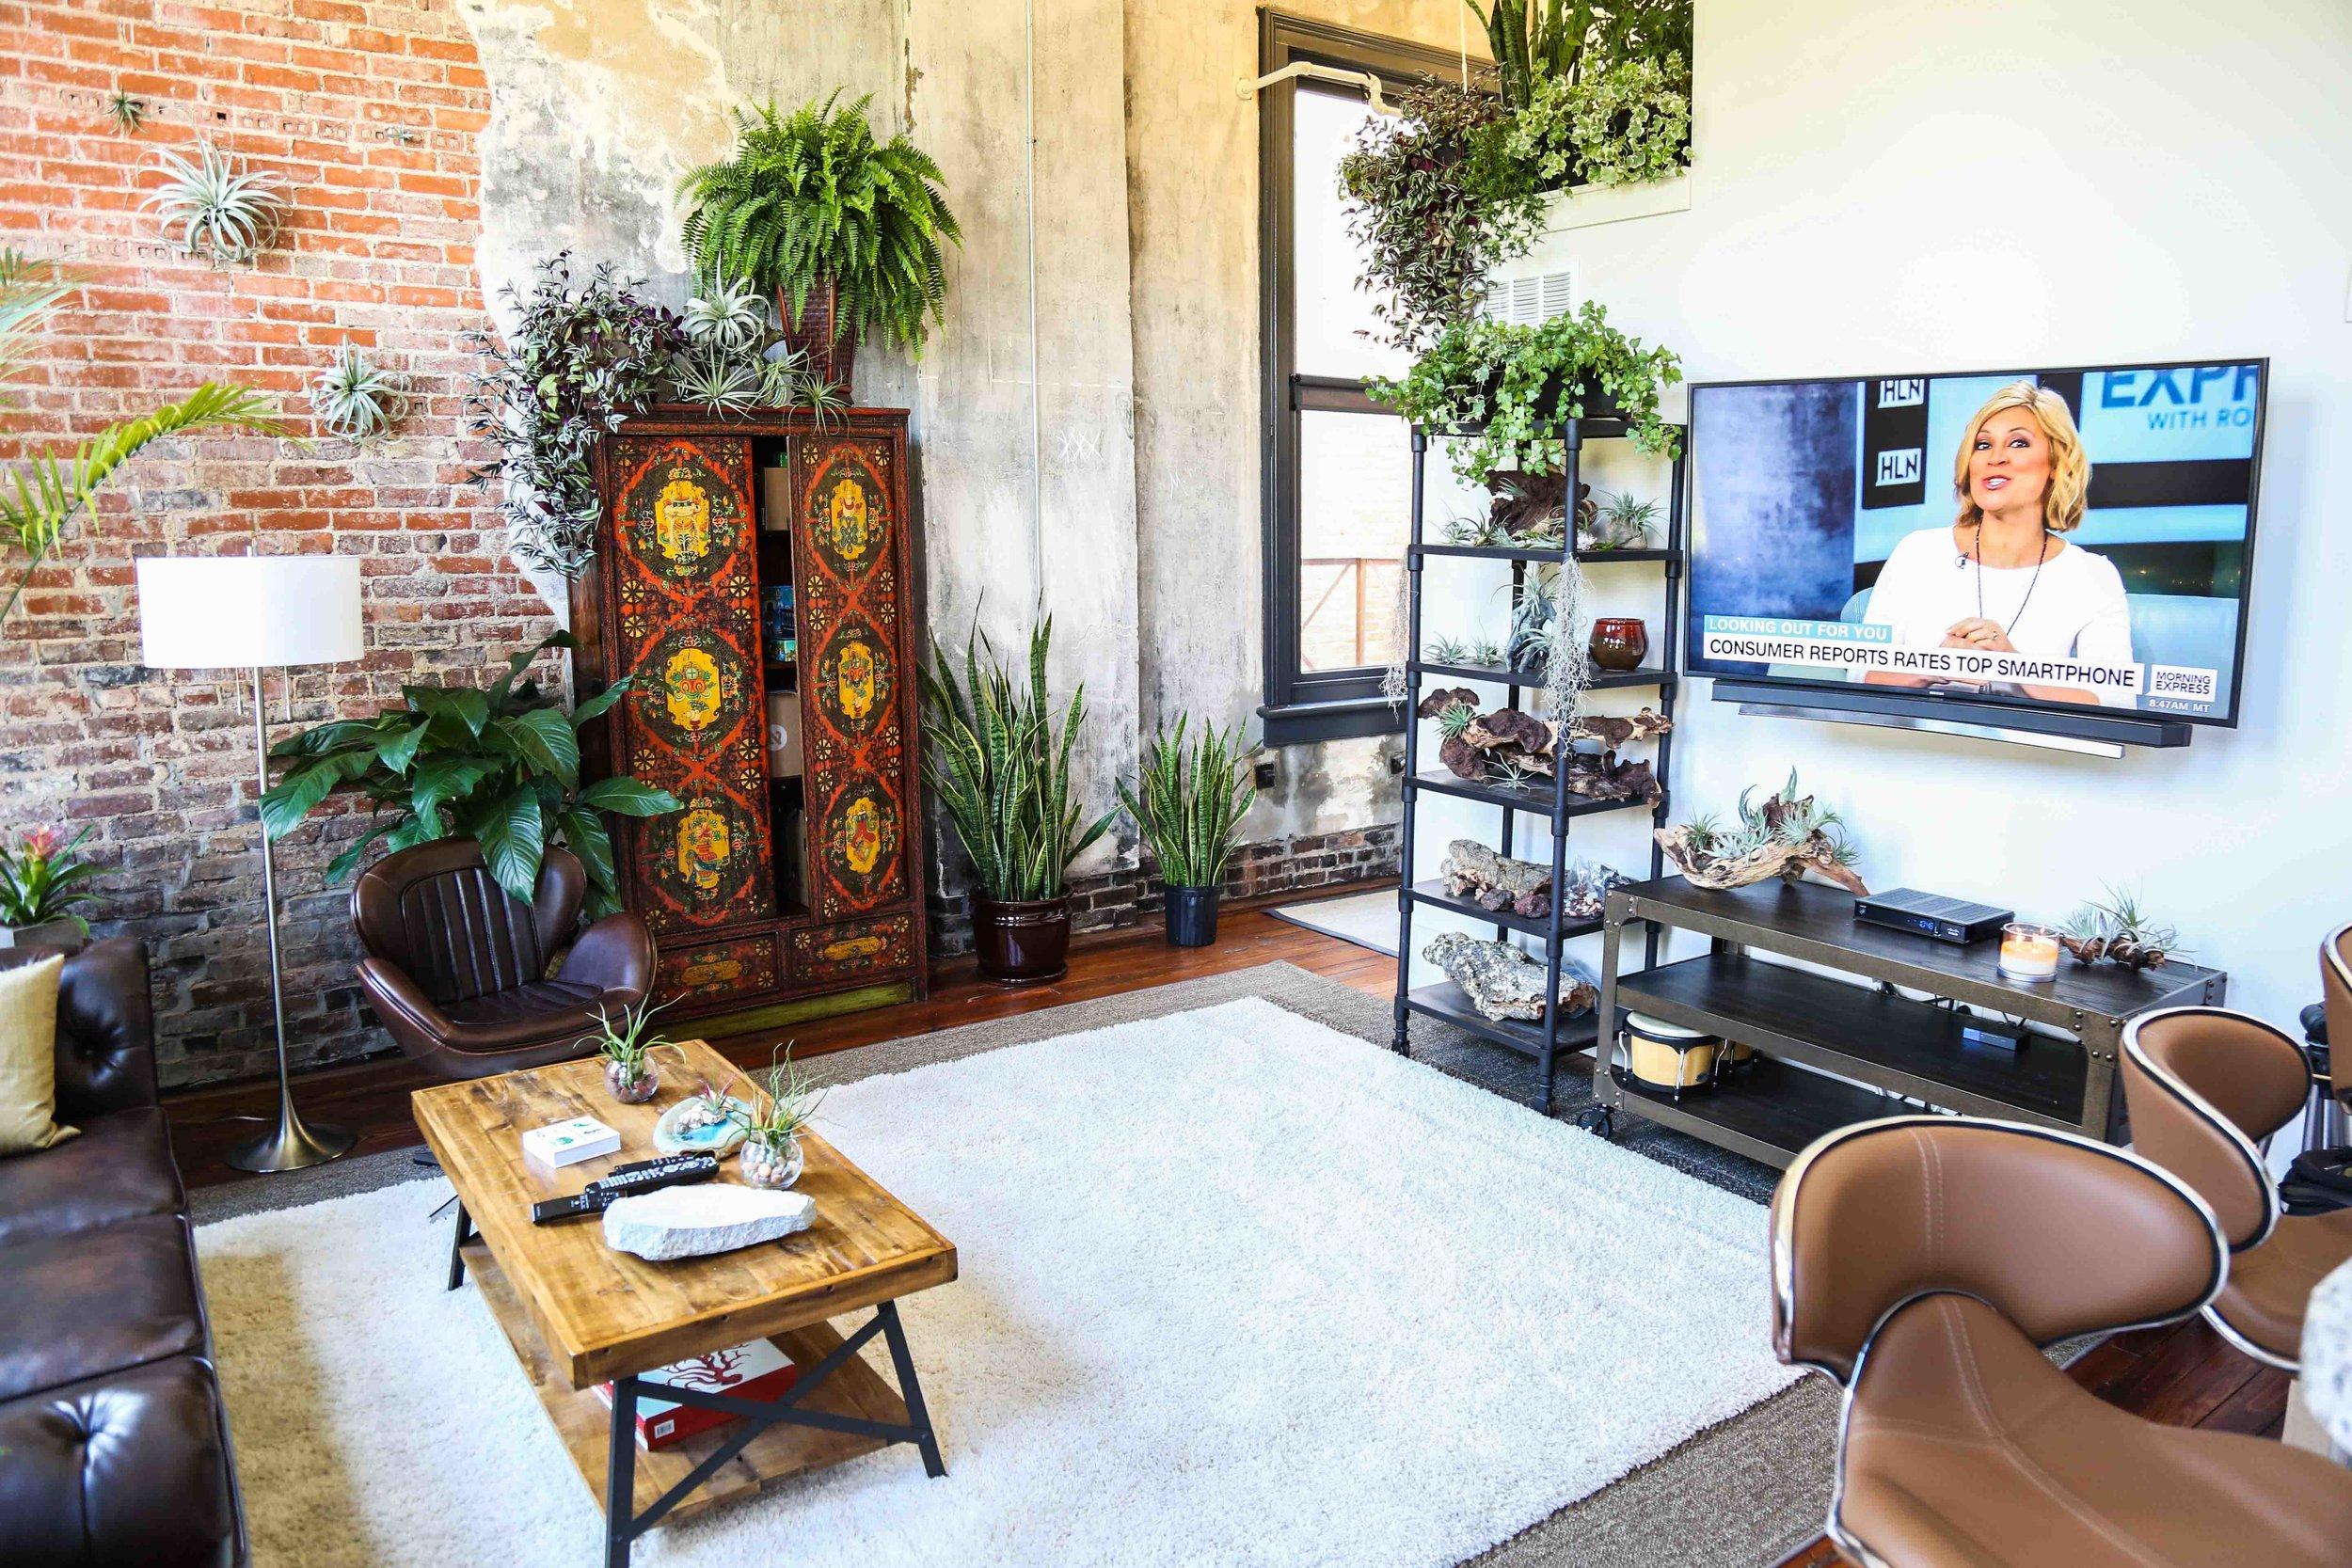 2 bedroom apartments for rent macon ga